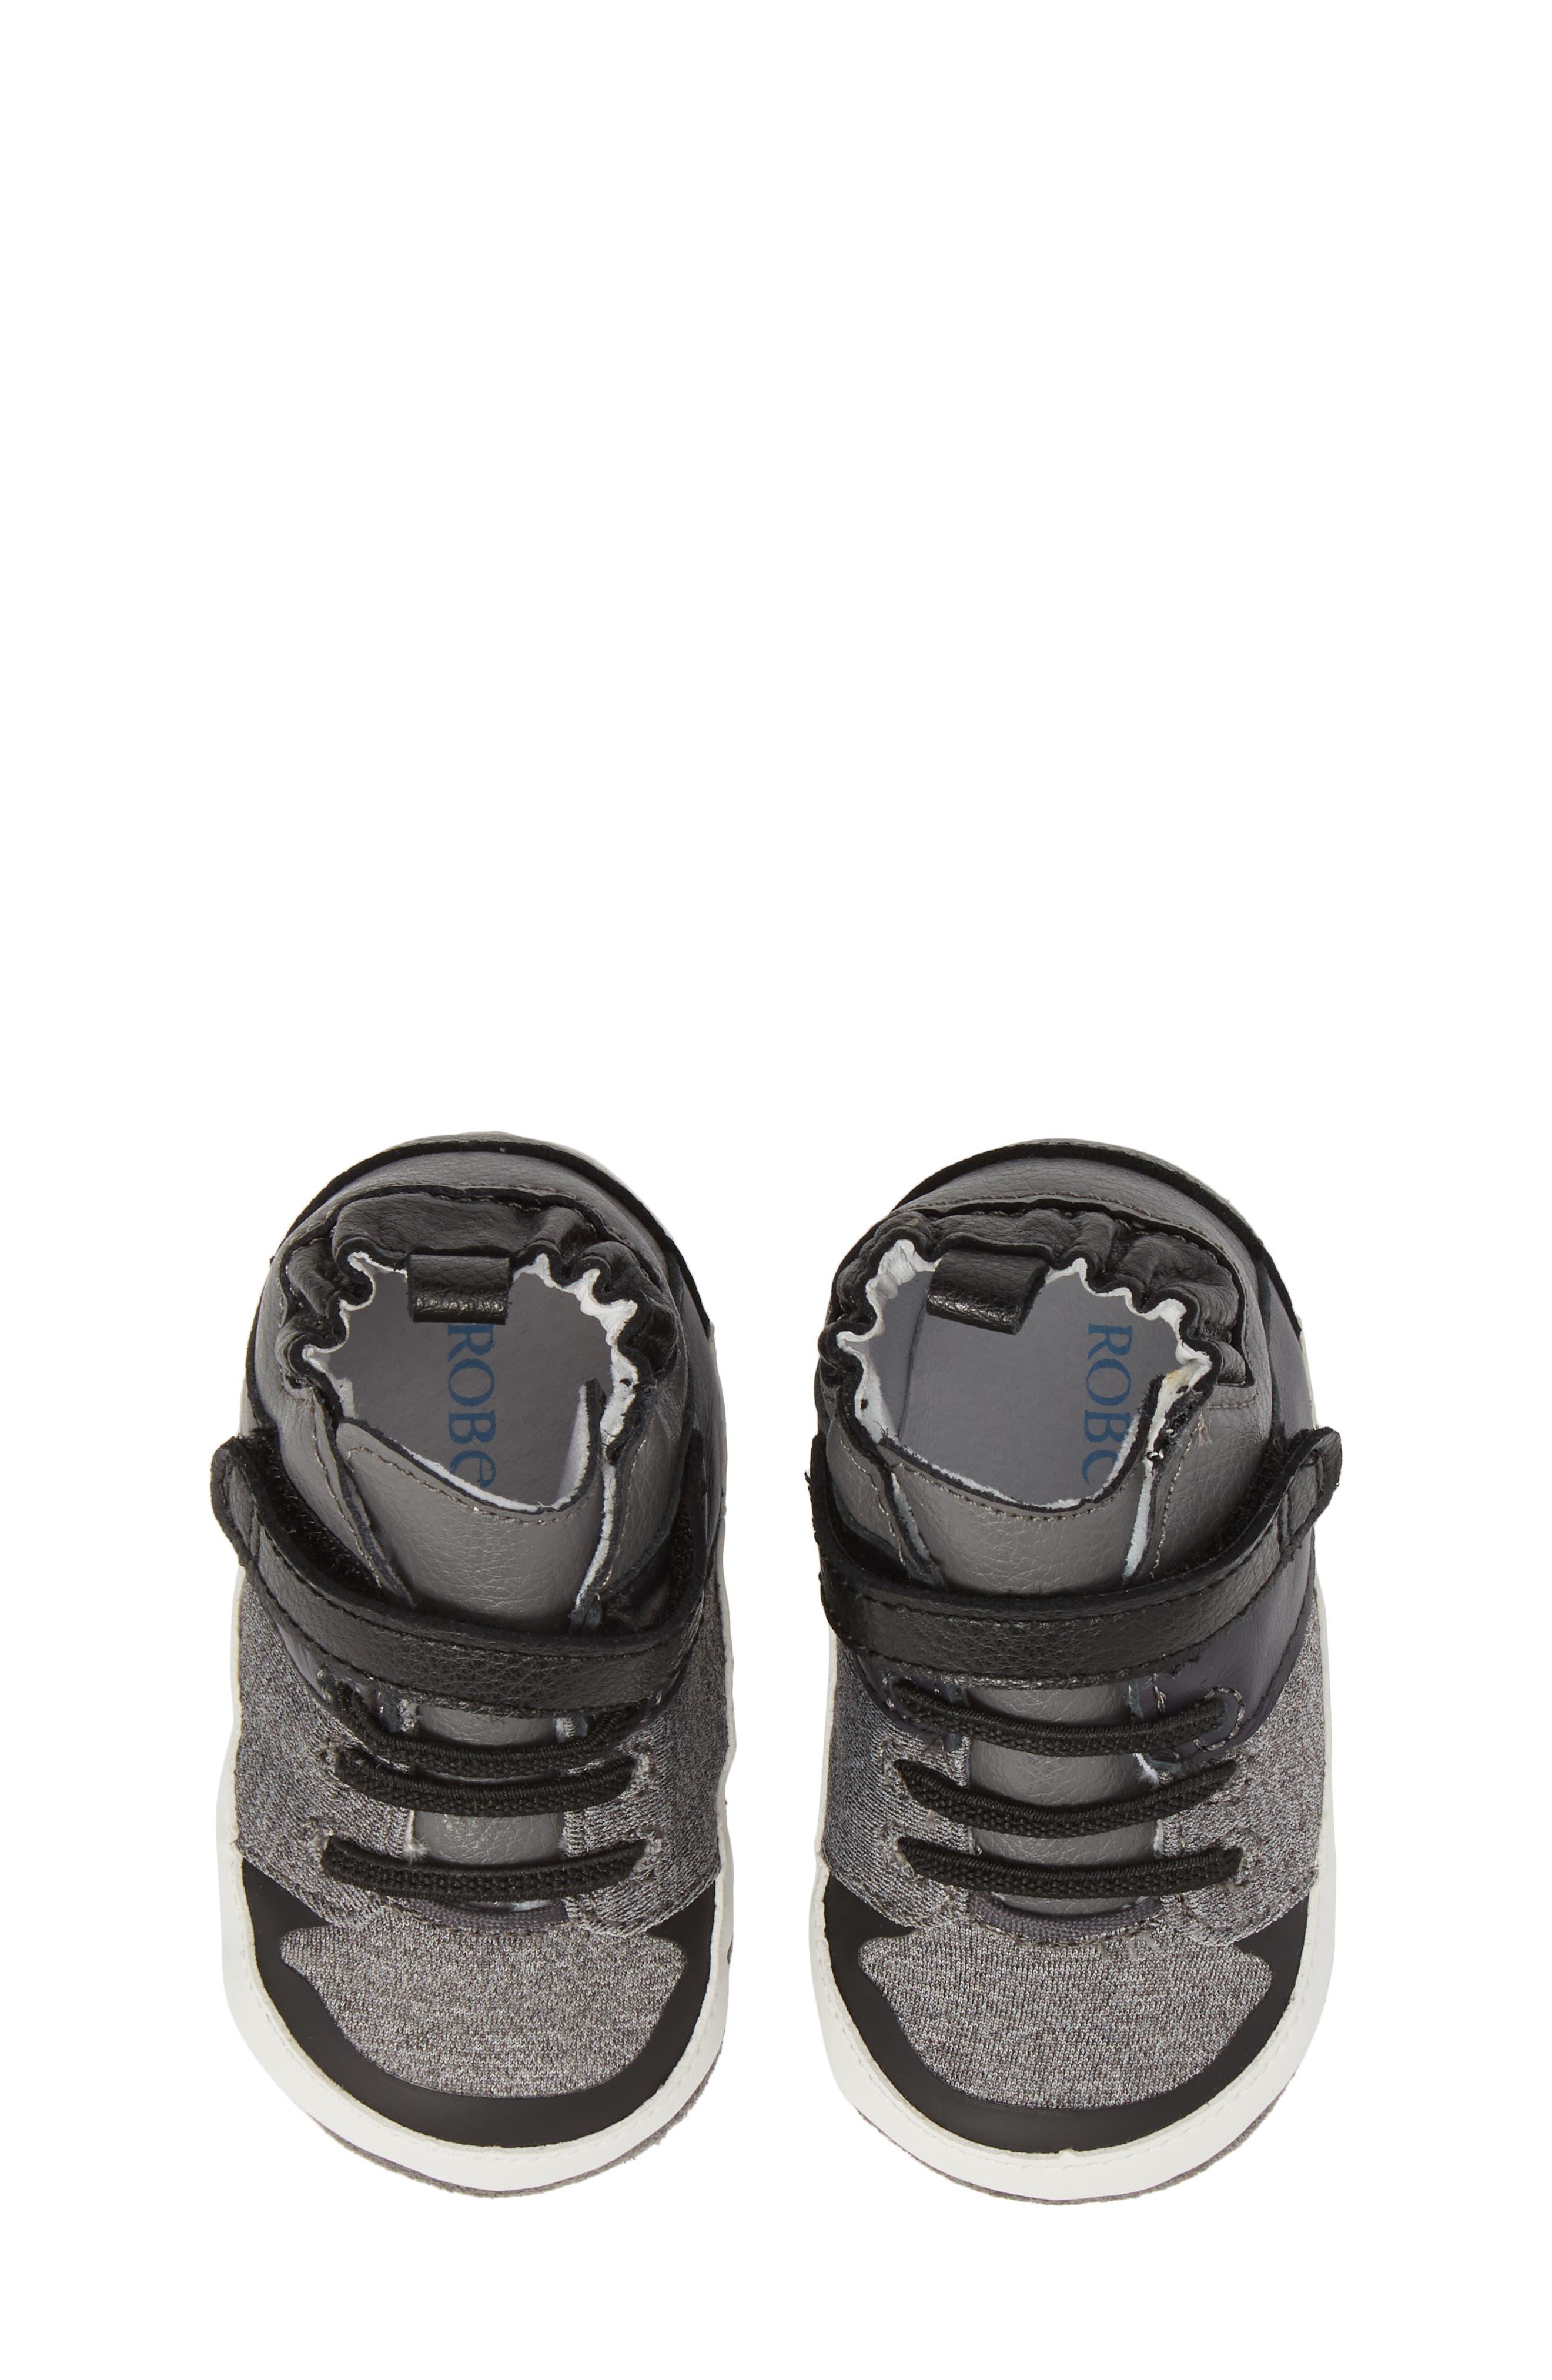 Main Image - Robeez® Zachary High Top Crib Sneaker (Baby & Walker)